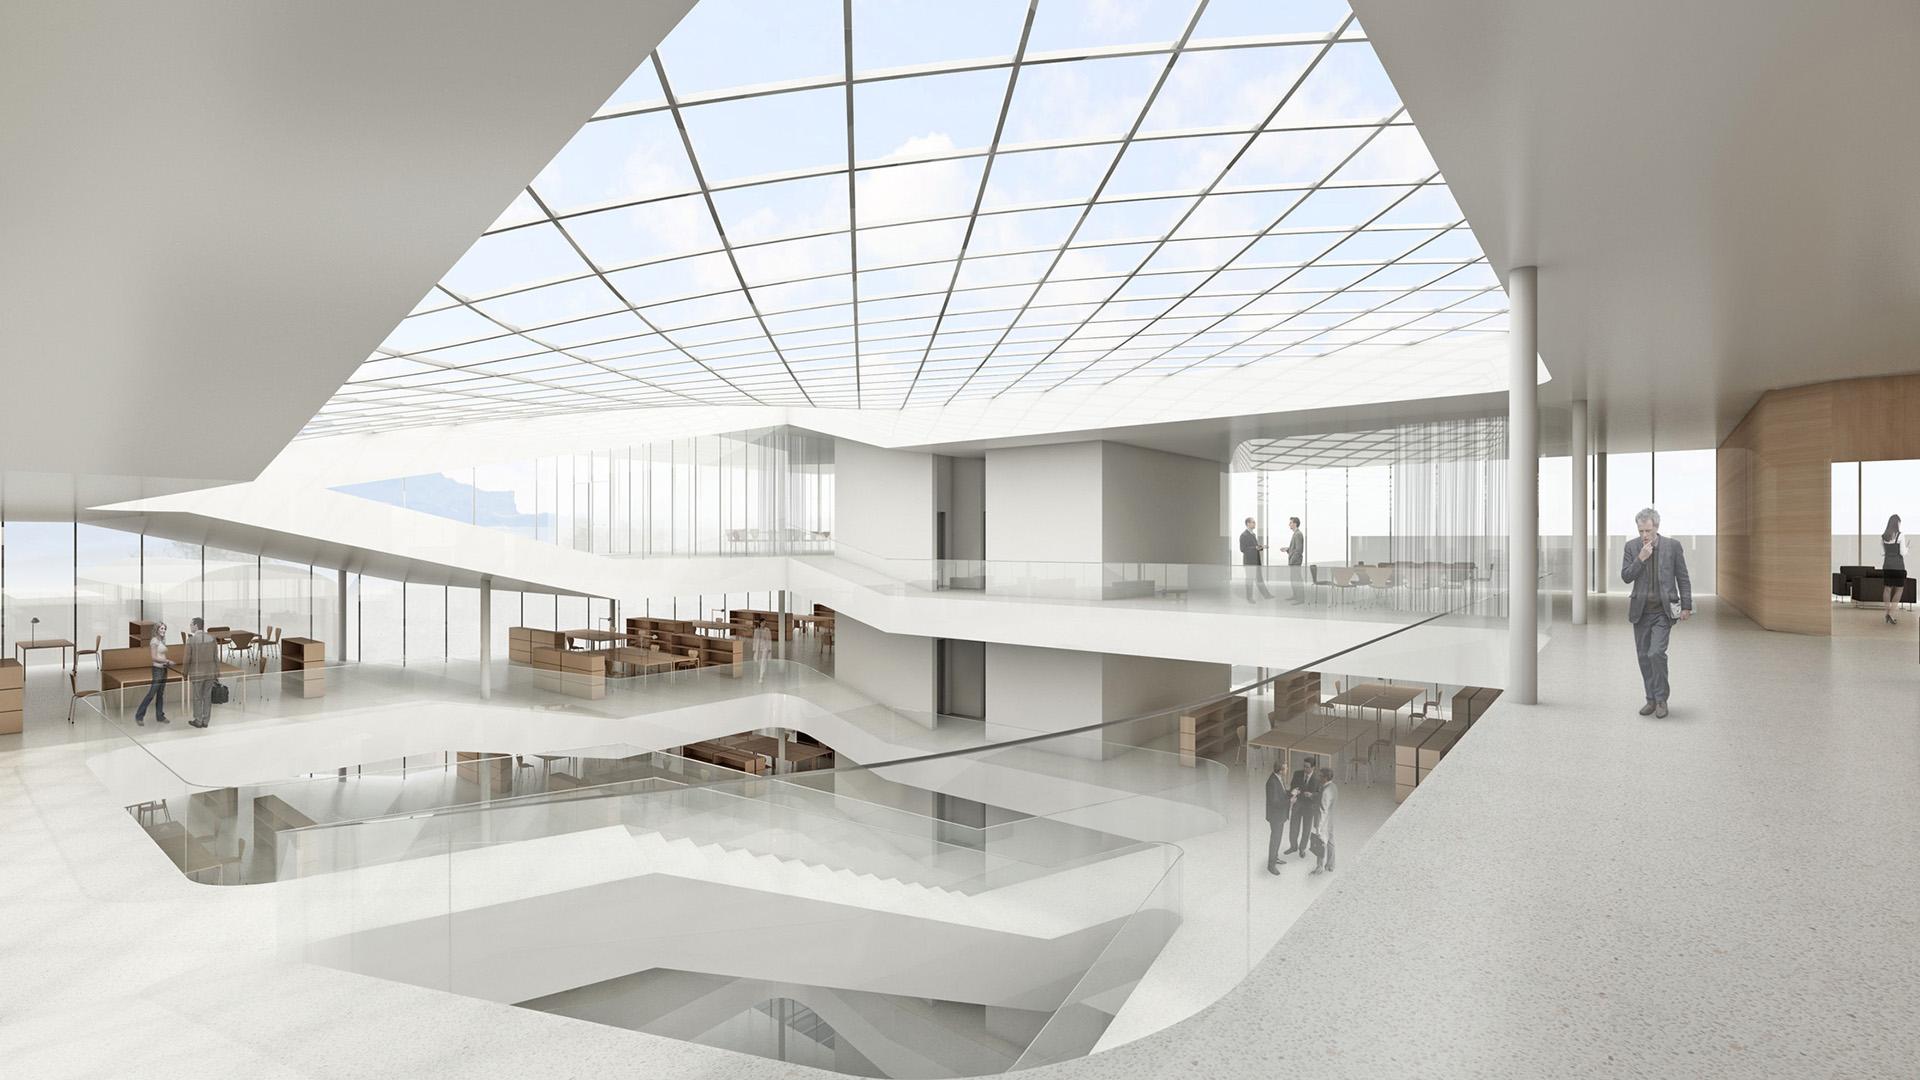 008-first-office-building-buero-philipp-moeller.jpg